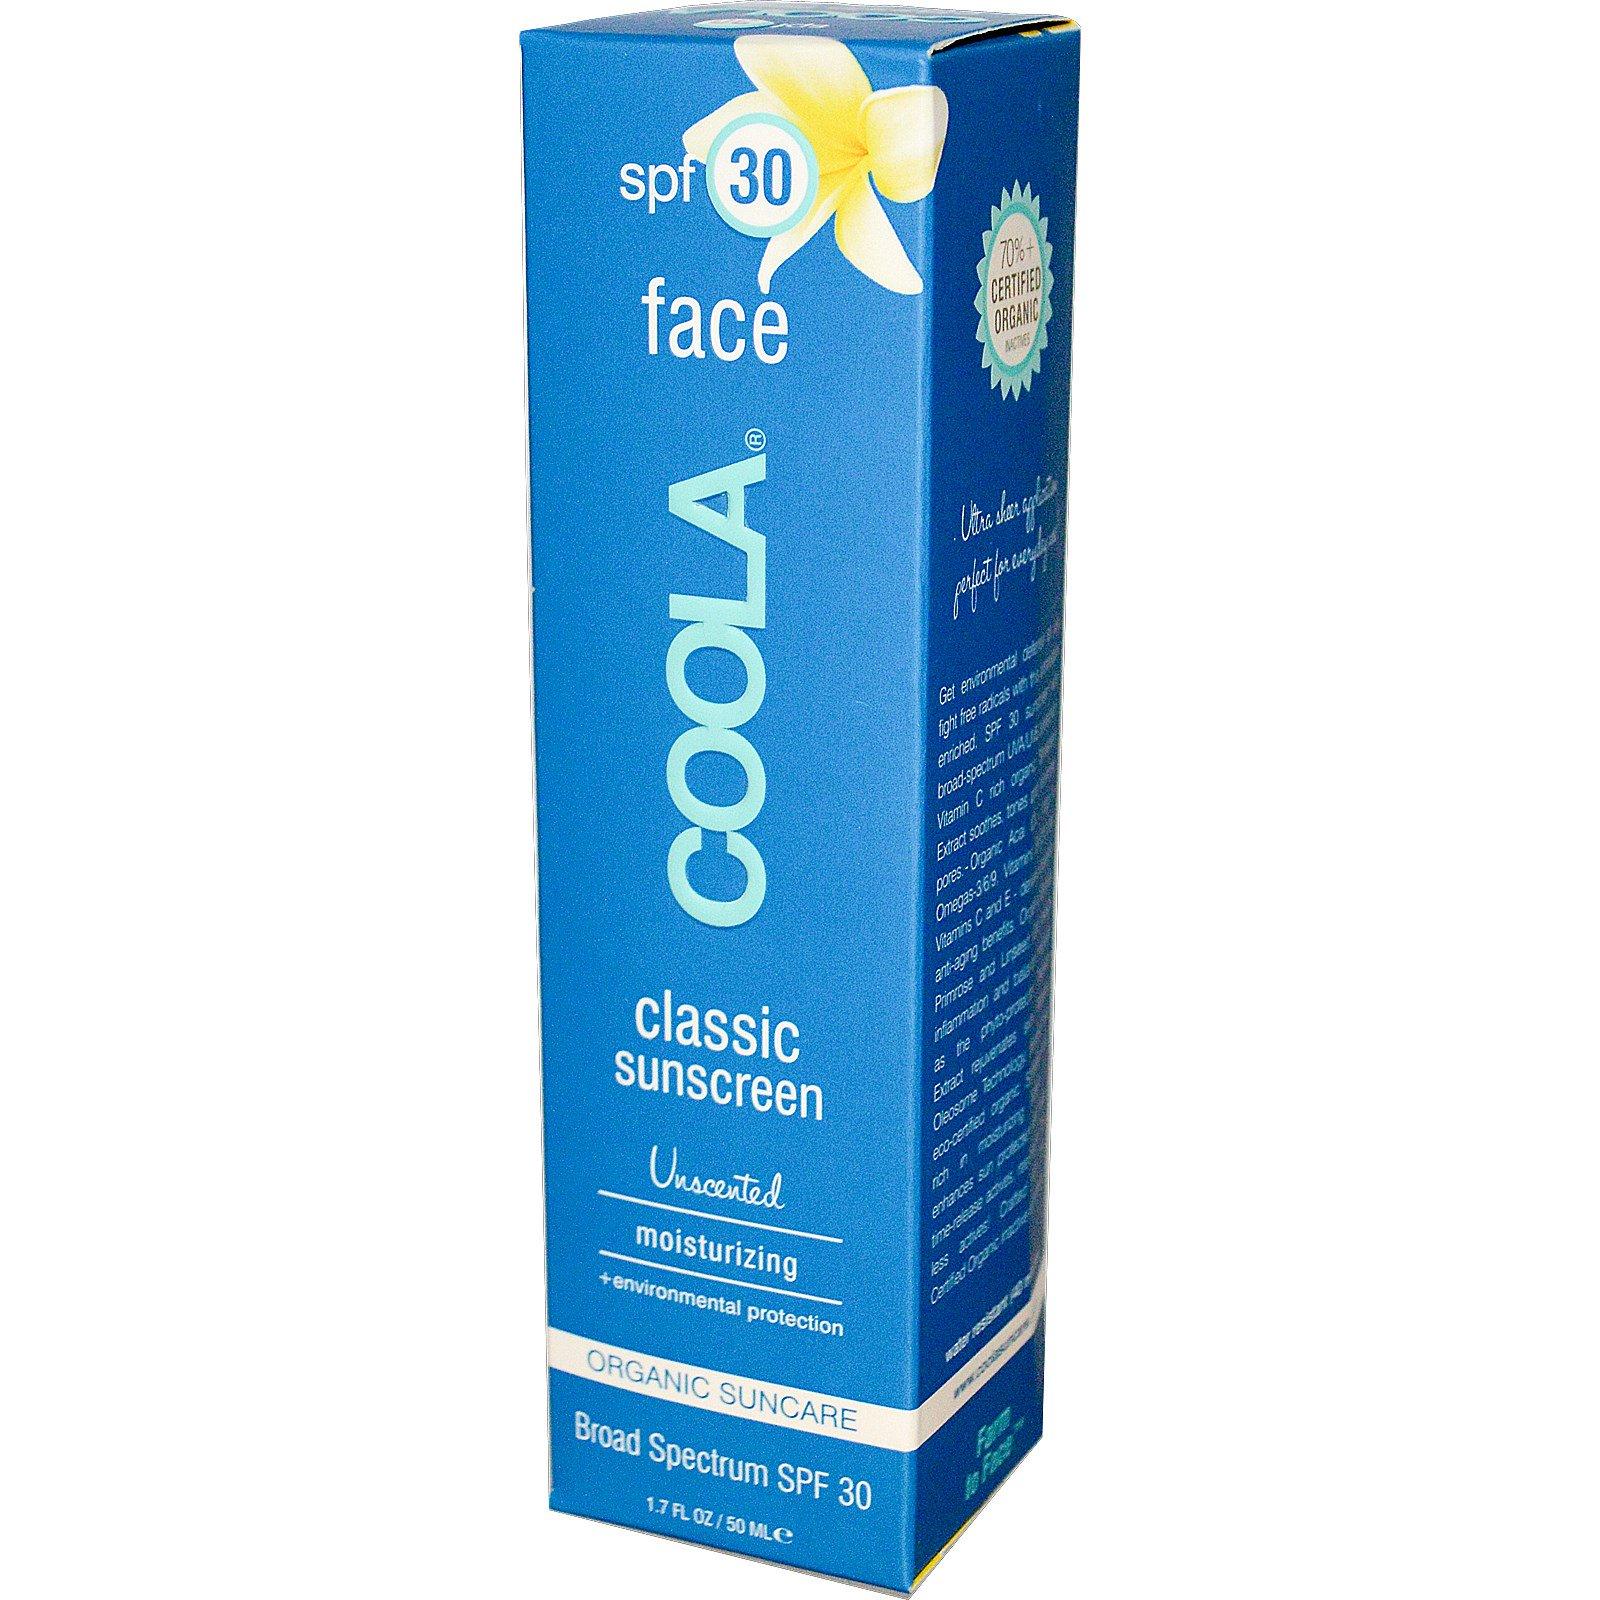 COOLA Organic Suncare Collection, Классический солнцезащитный крем для лица с SPF 30 без запаха, 50 мл